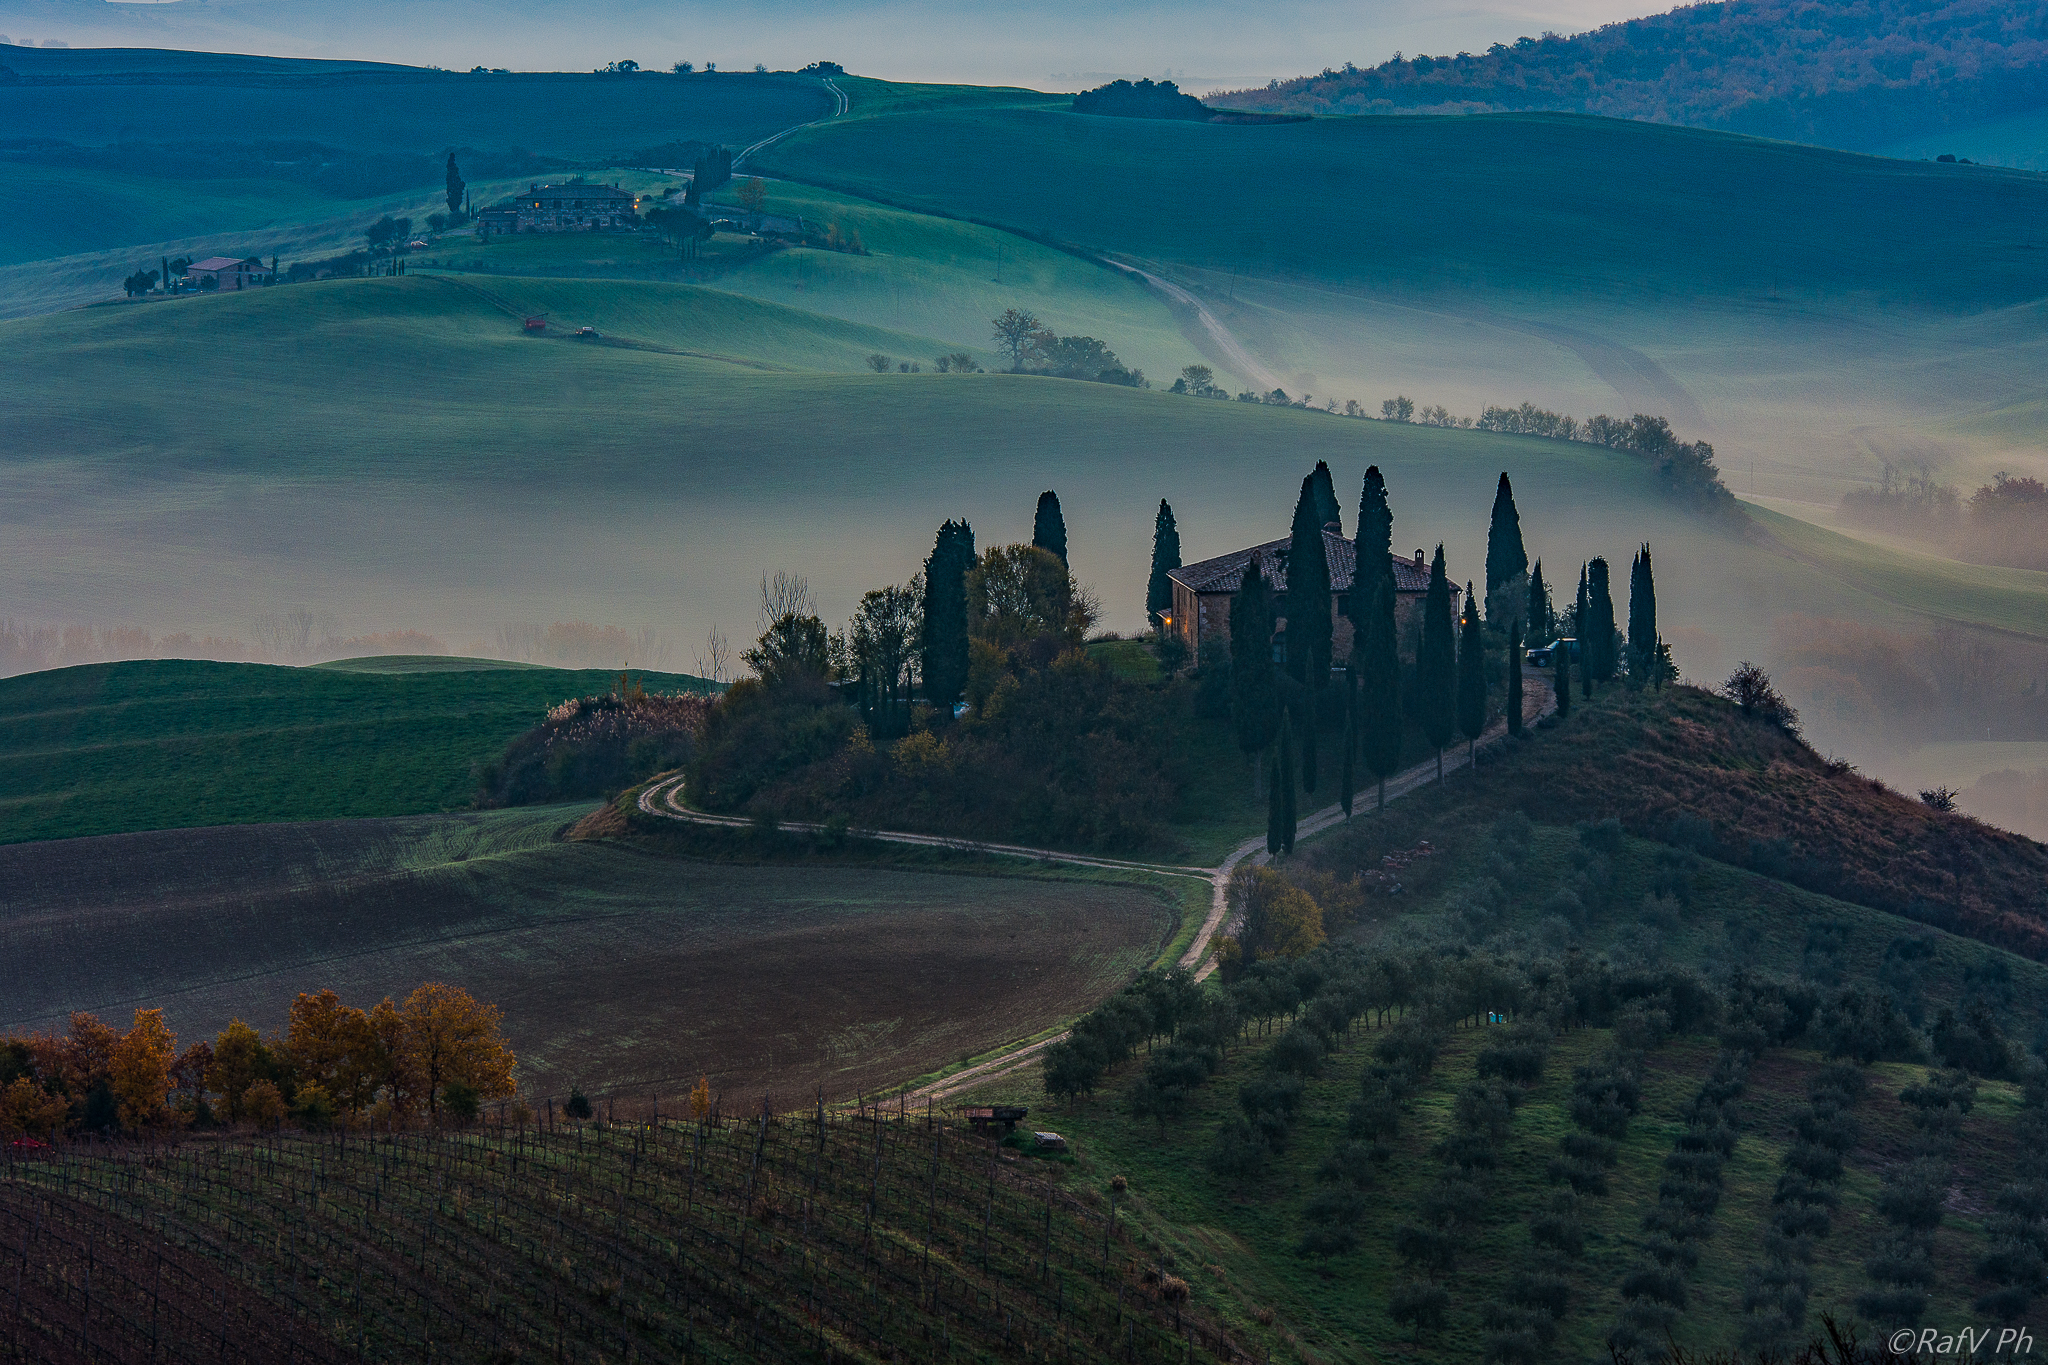 Magic Sunrise in Tuscan Landsacape...